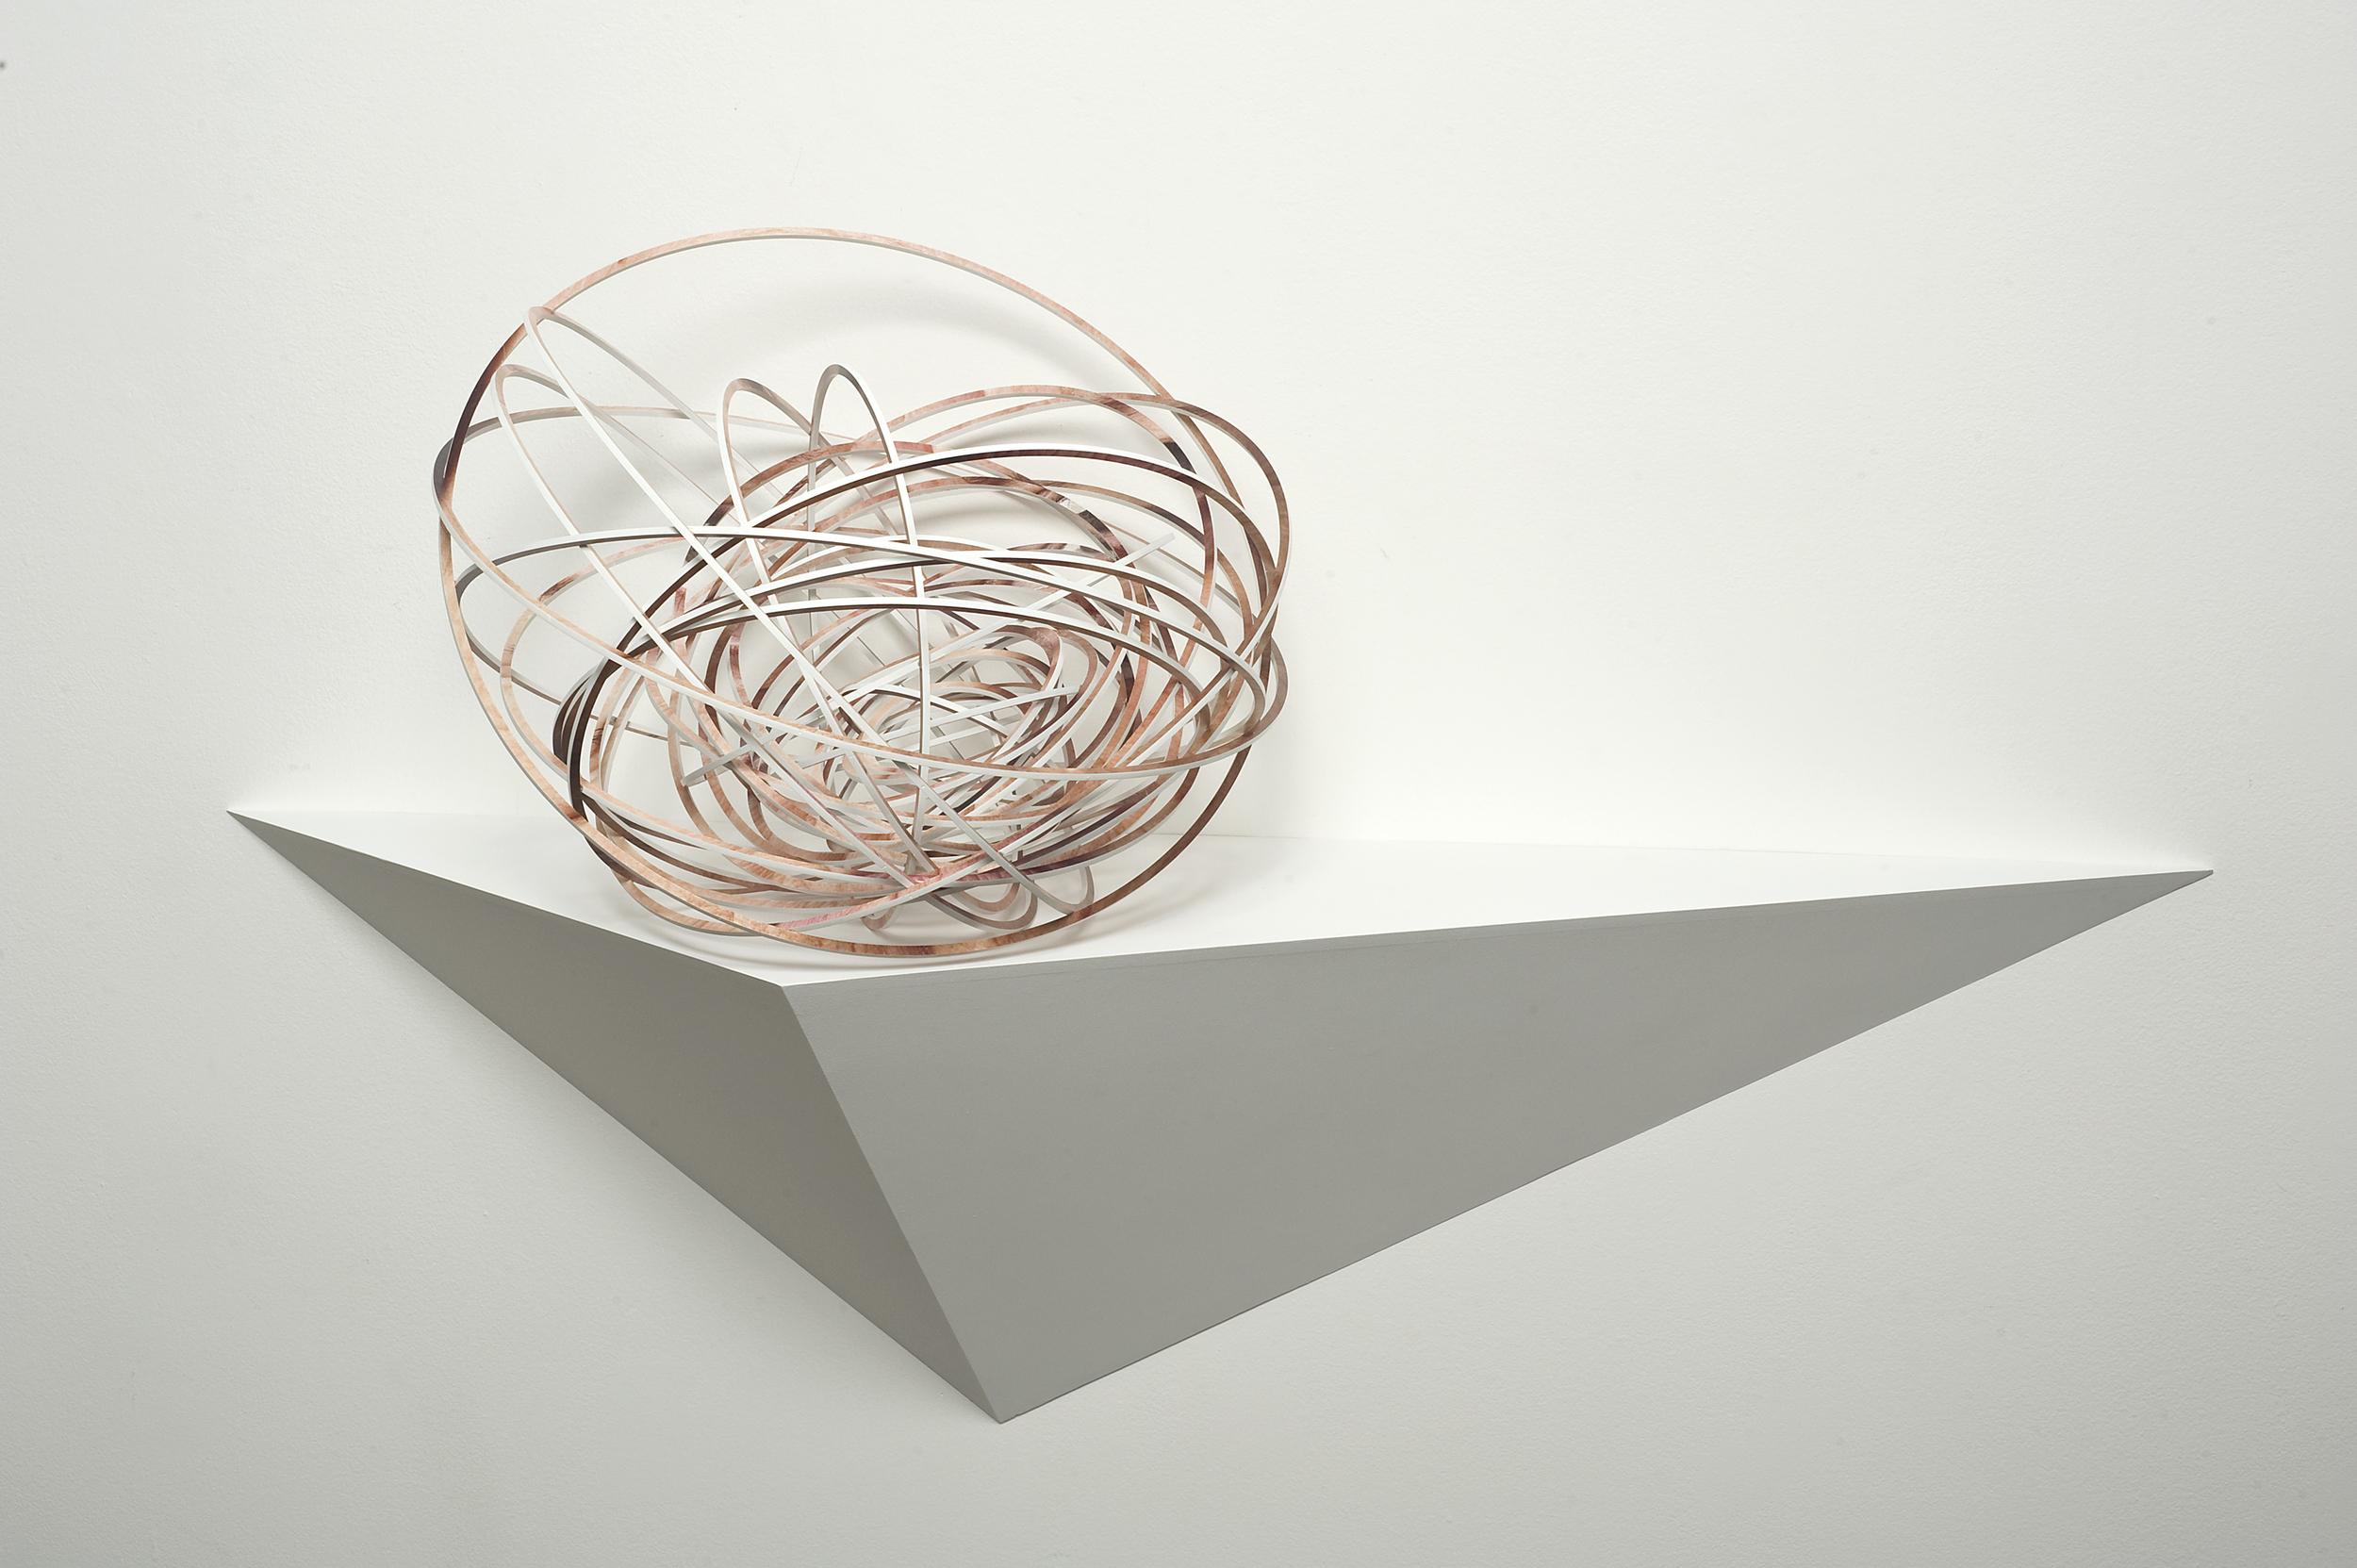 Justine Khamara,  Orbital Spin Trick #2  , 2013,UV print on laser-cut plywood sculpture, 50 x 50 x 50cm.